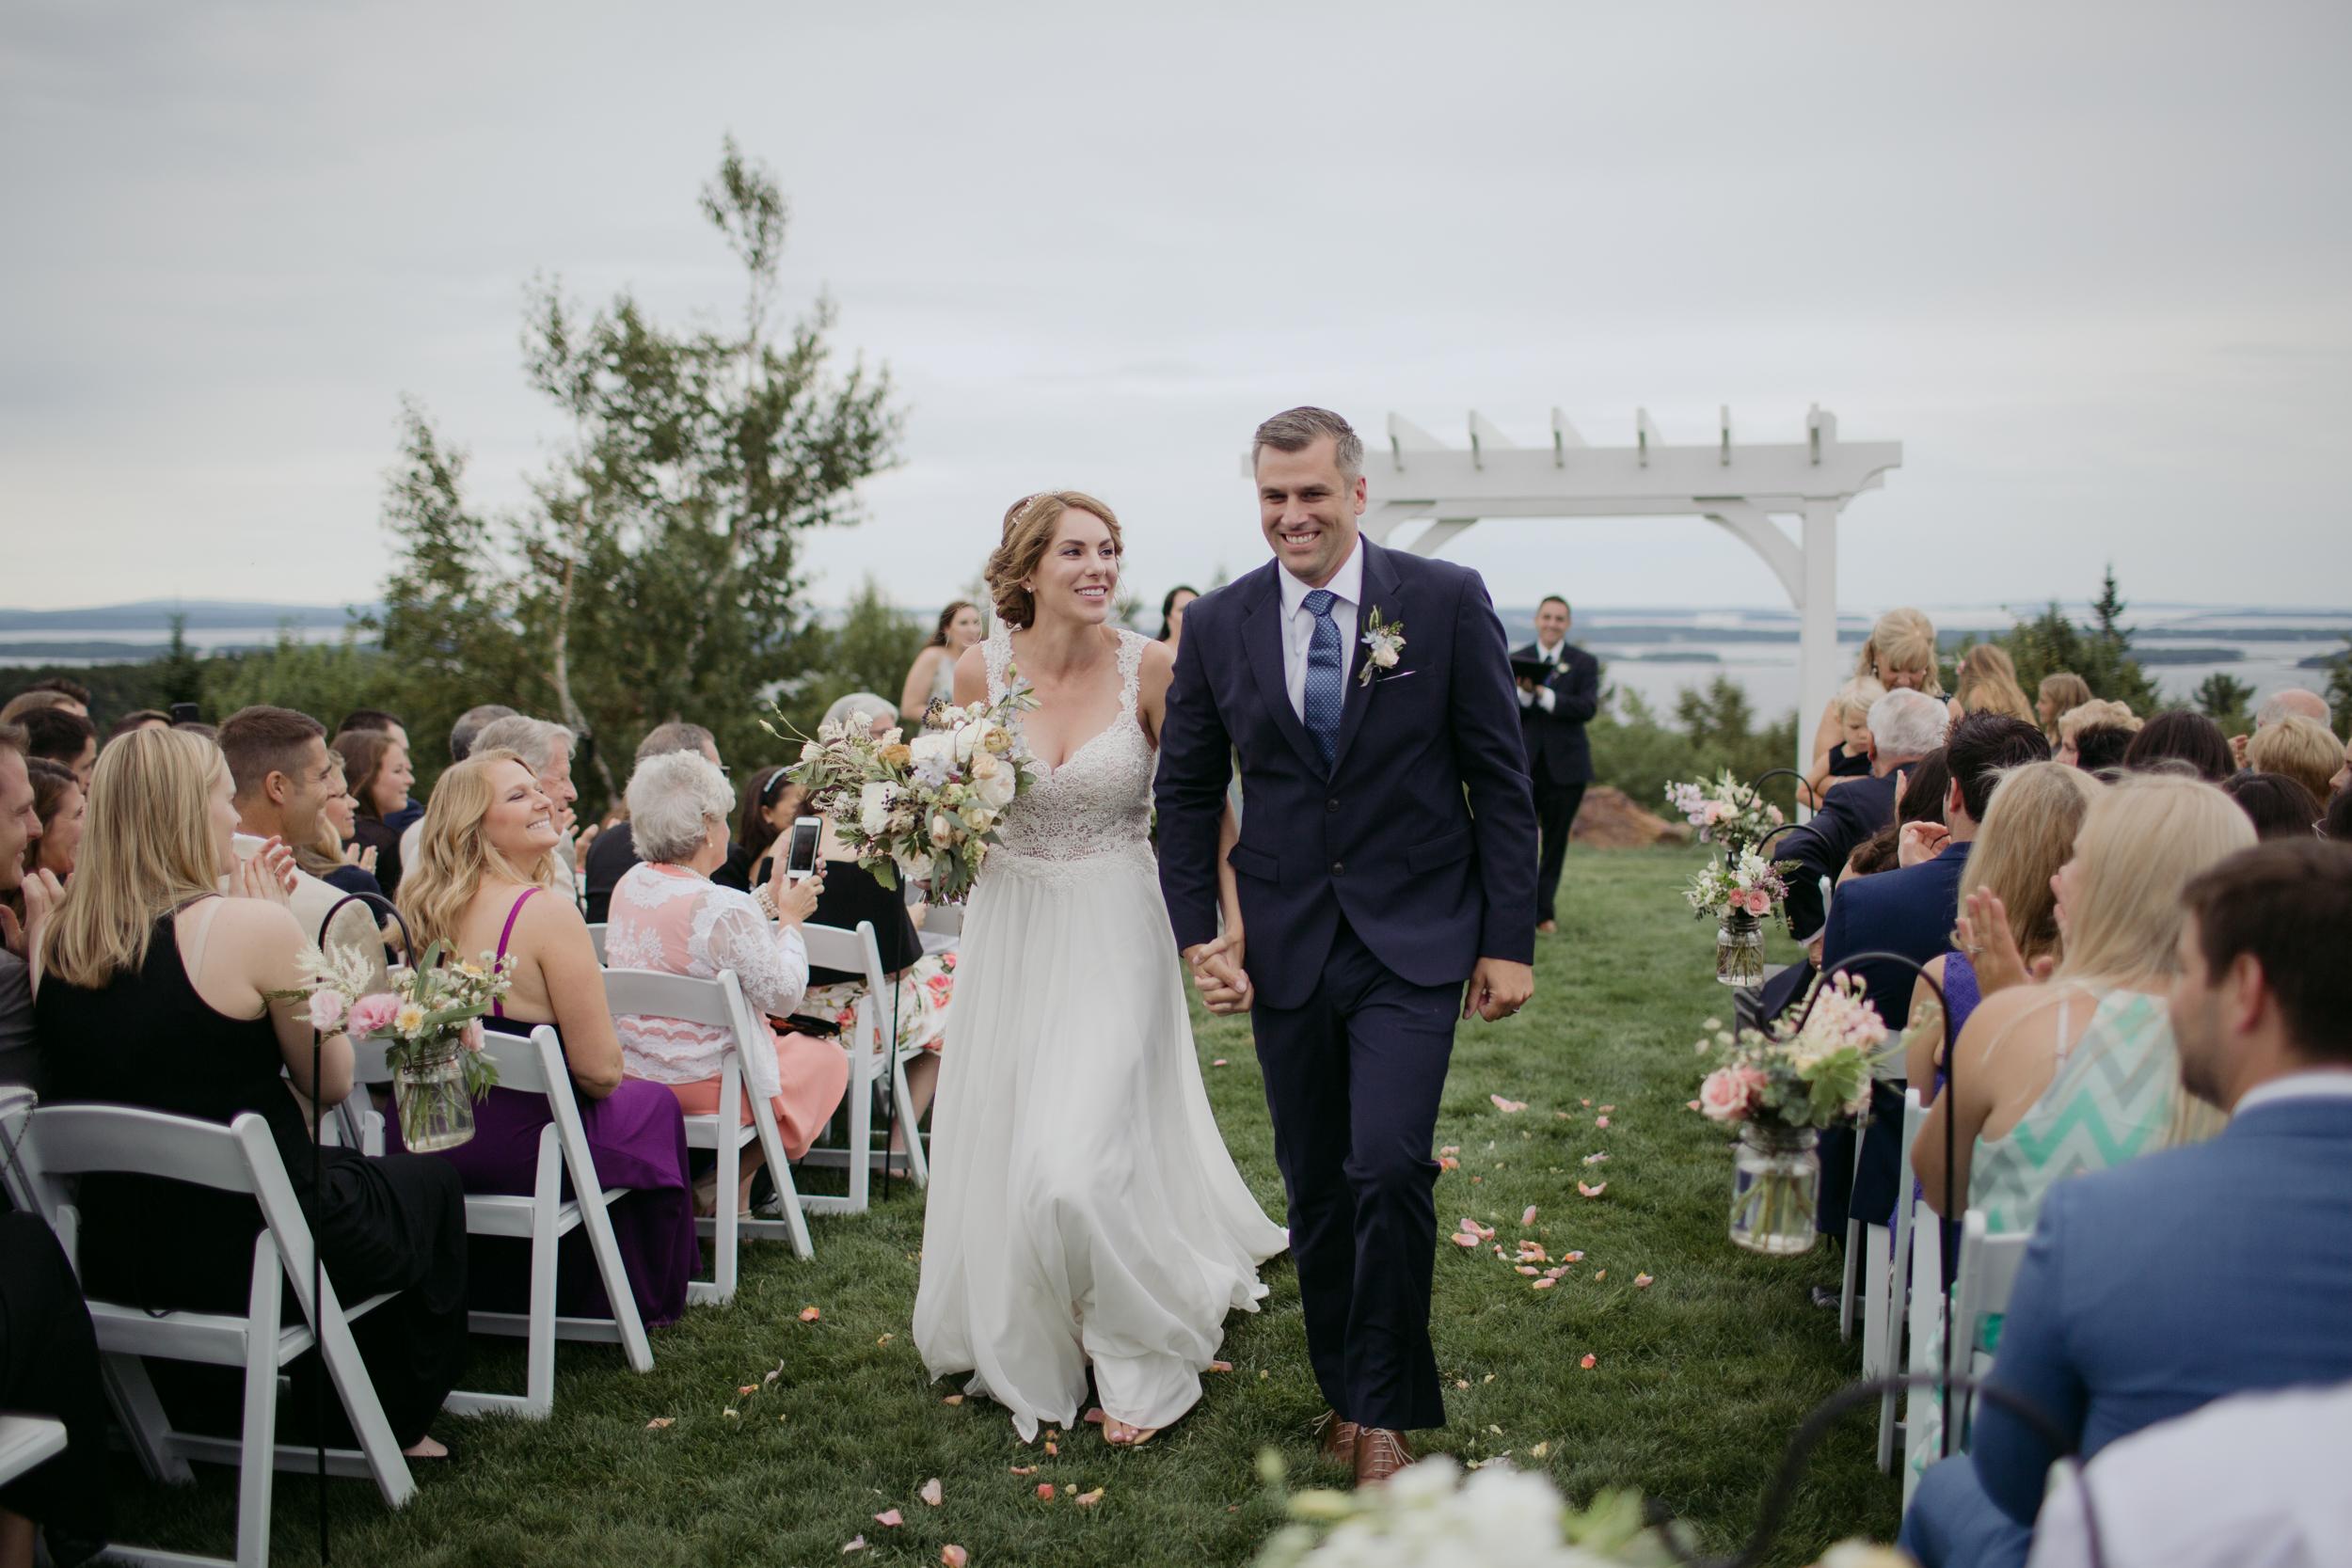 point_lookout_northport_Maine_Midcoast_wedding_leslie_justin-17.jpg